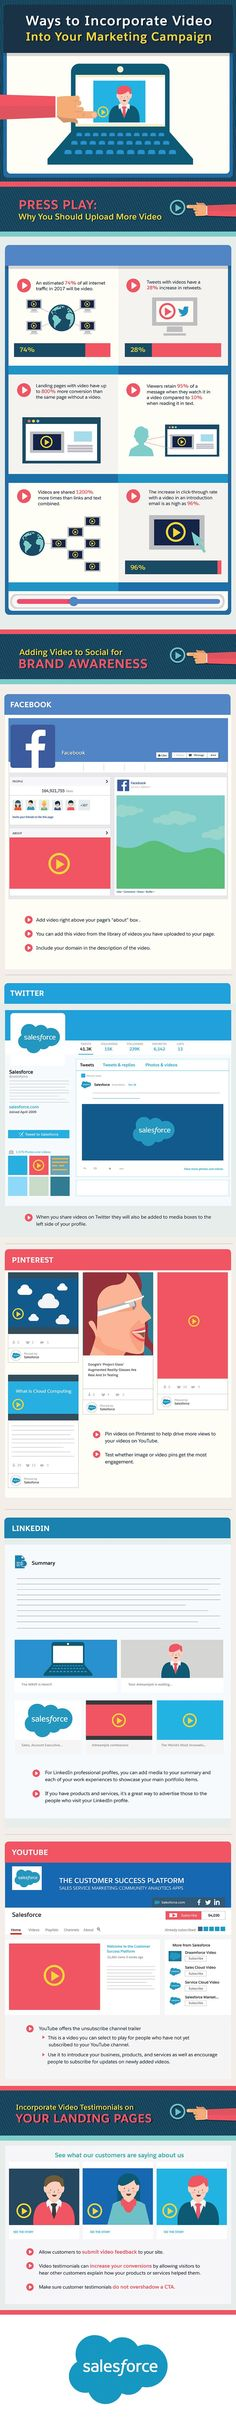 Video marketing [#Infographic]